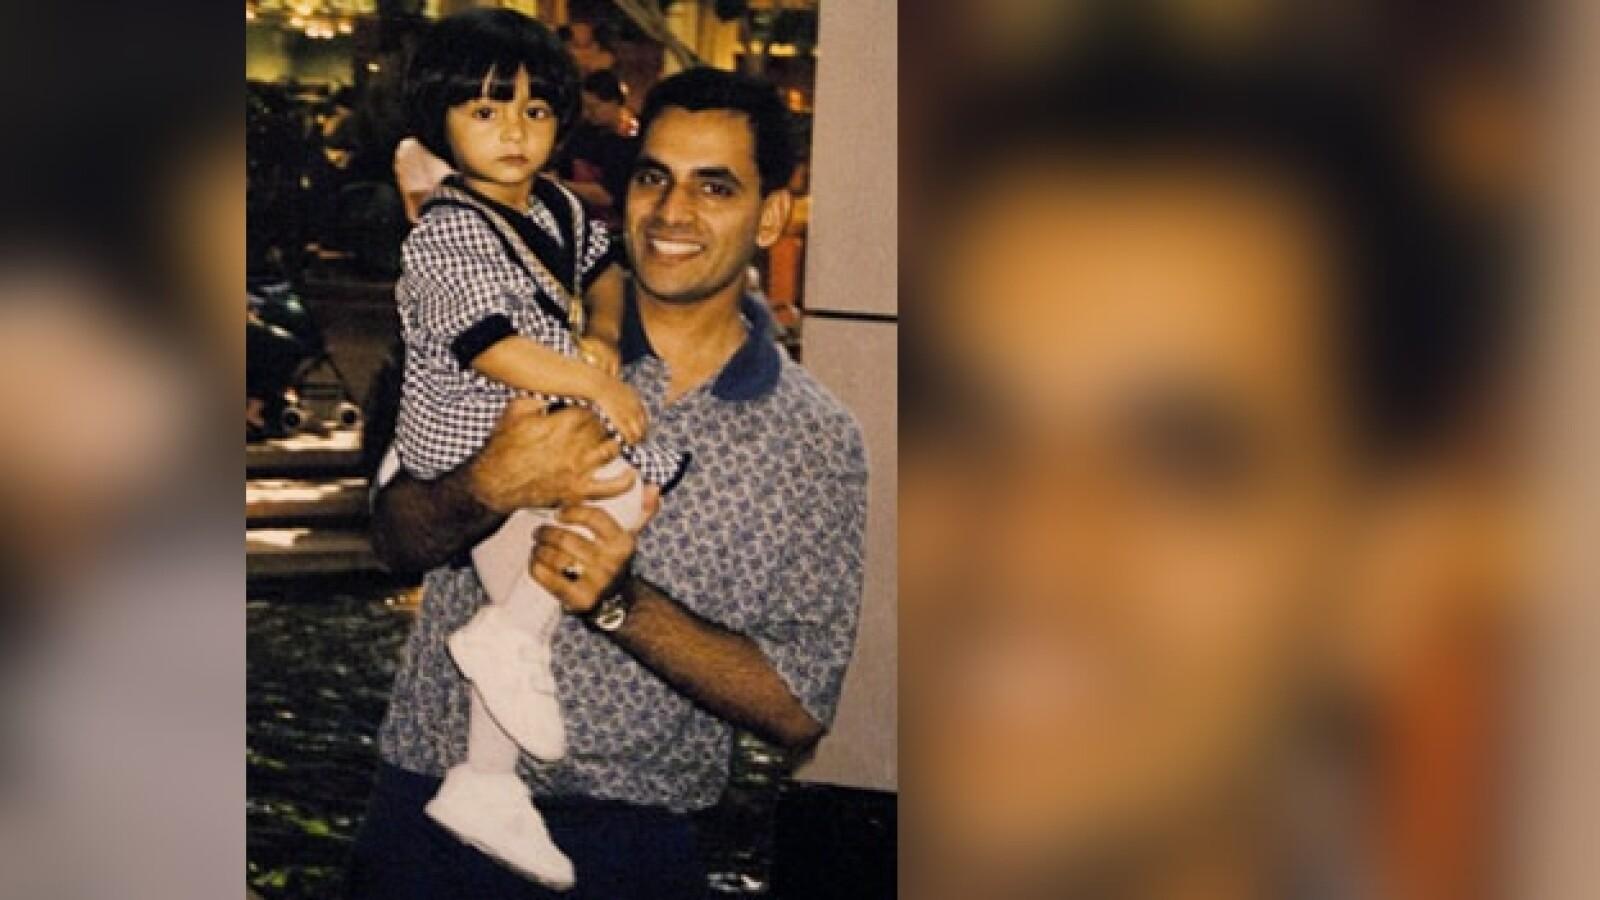 11-S - familia musulmana - padre e hija